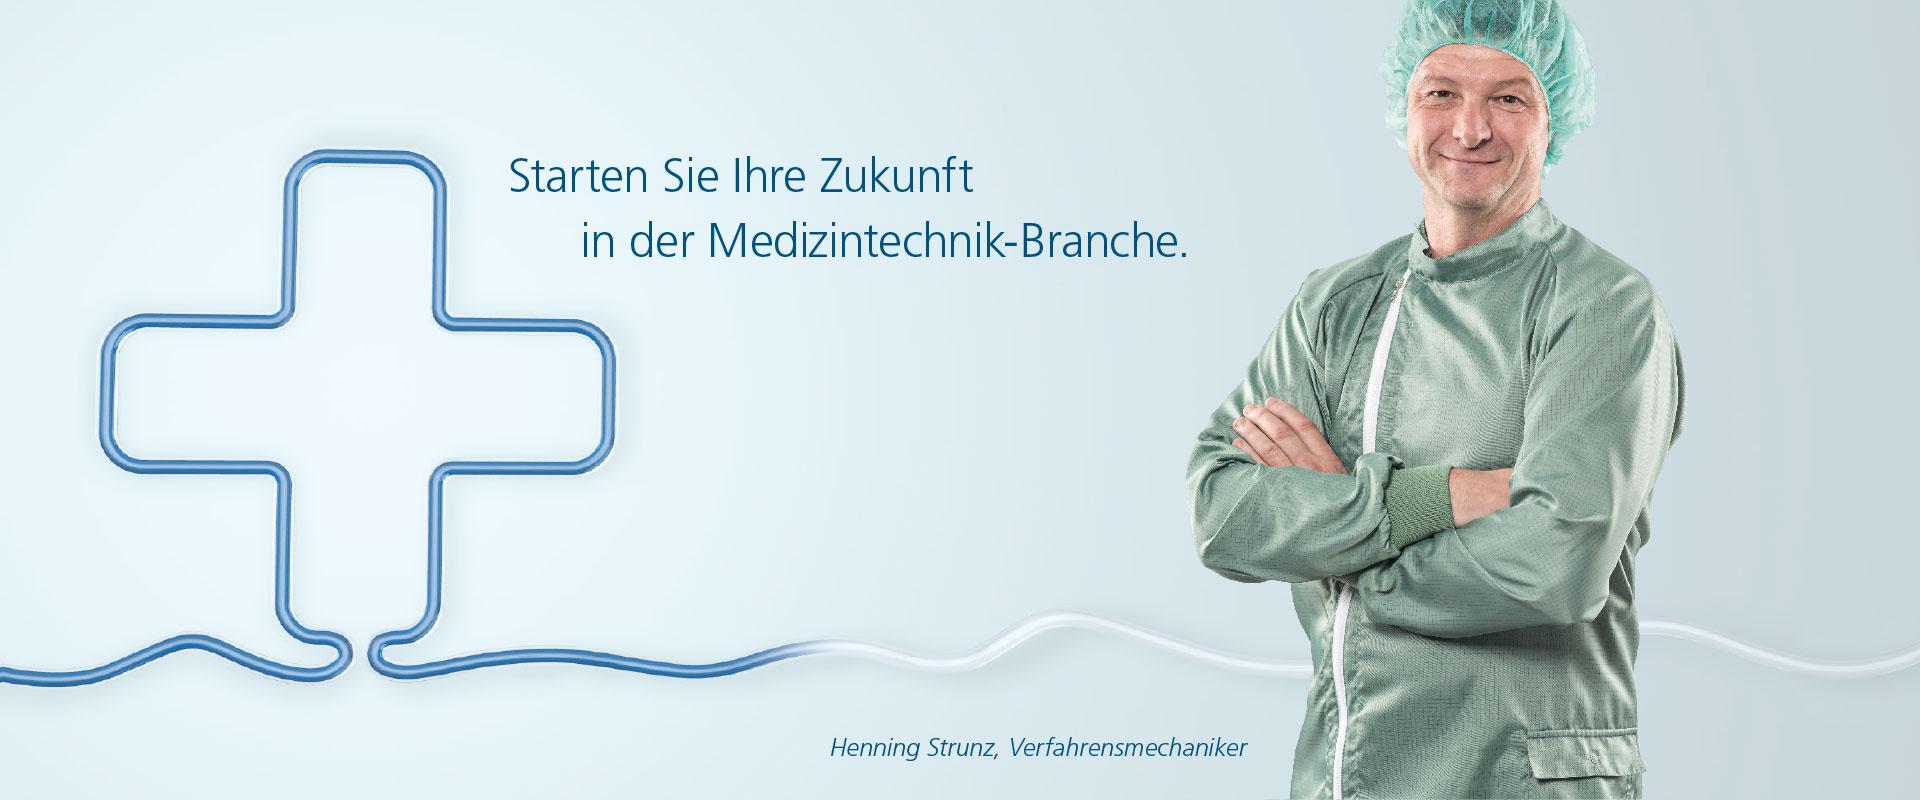 OPUS Marketing / Projekte / RAUMEDIC / Employer Branding / Medizintechnik